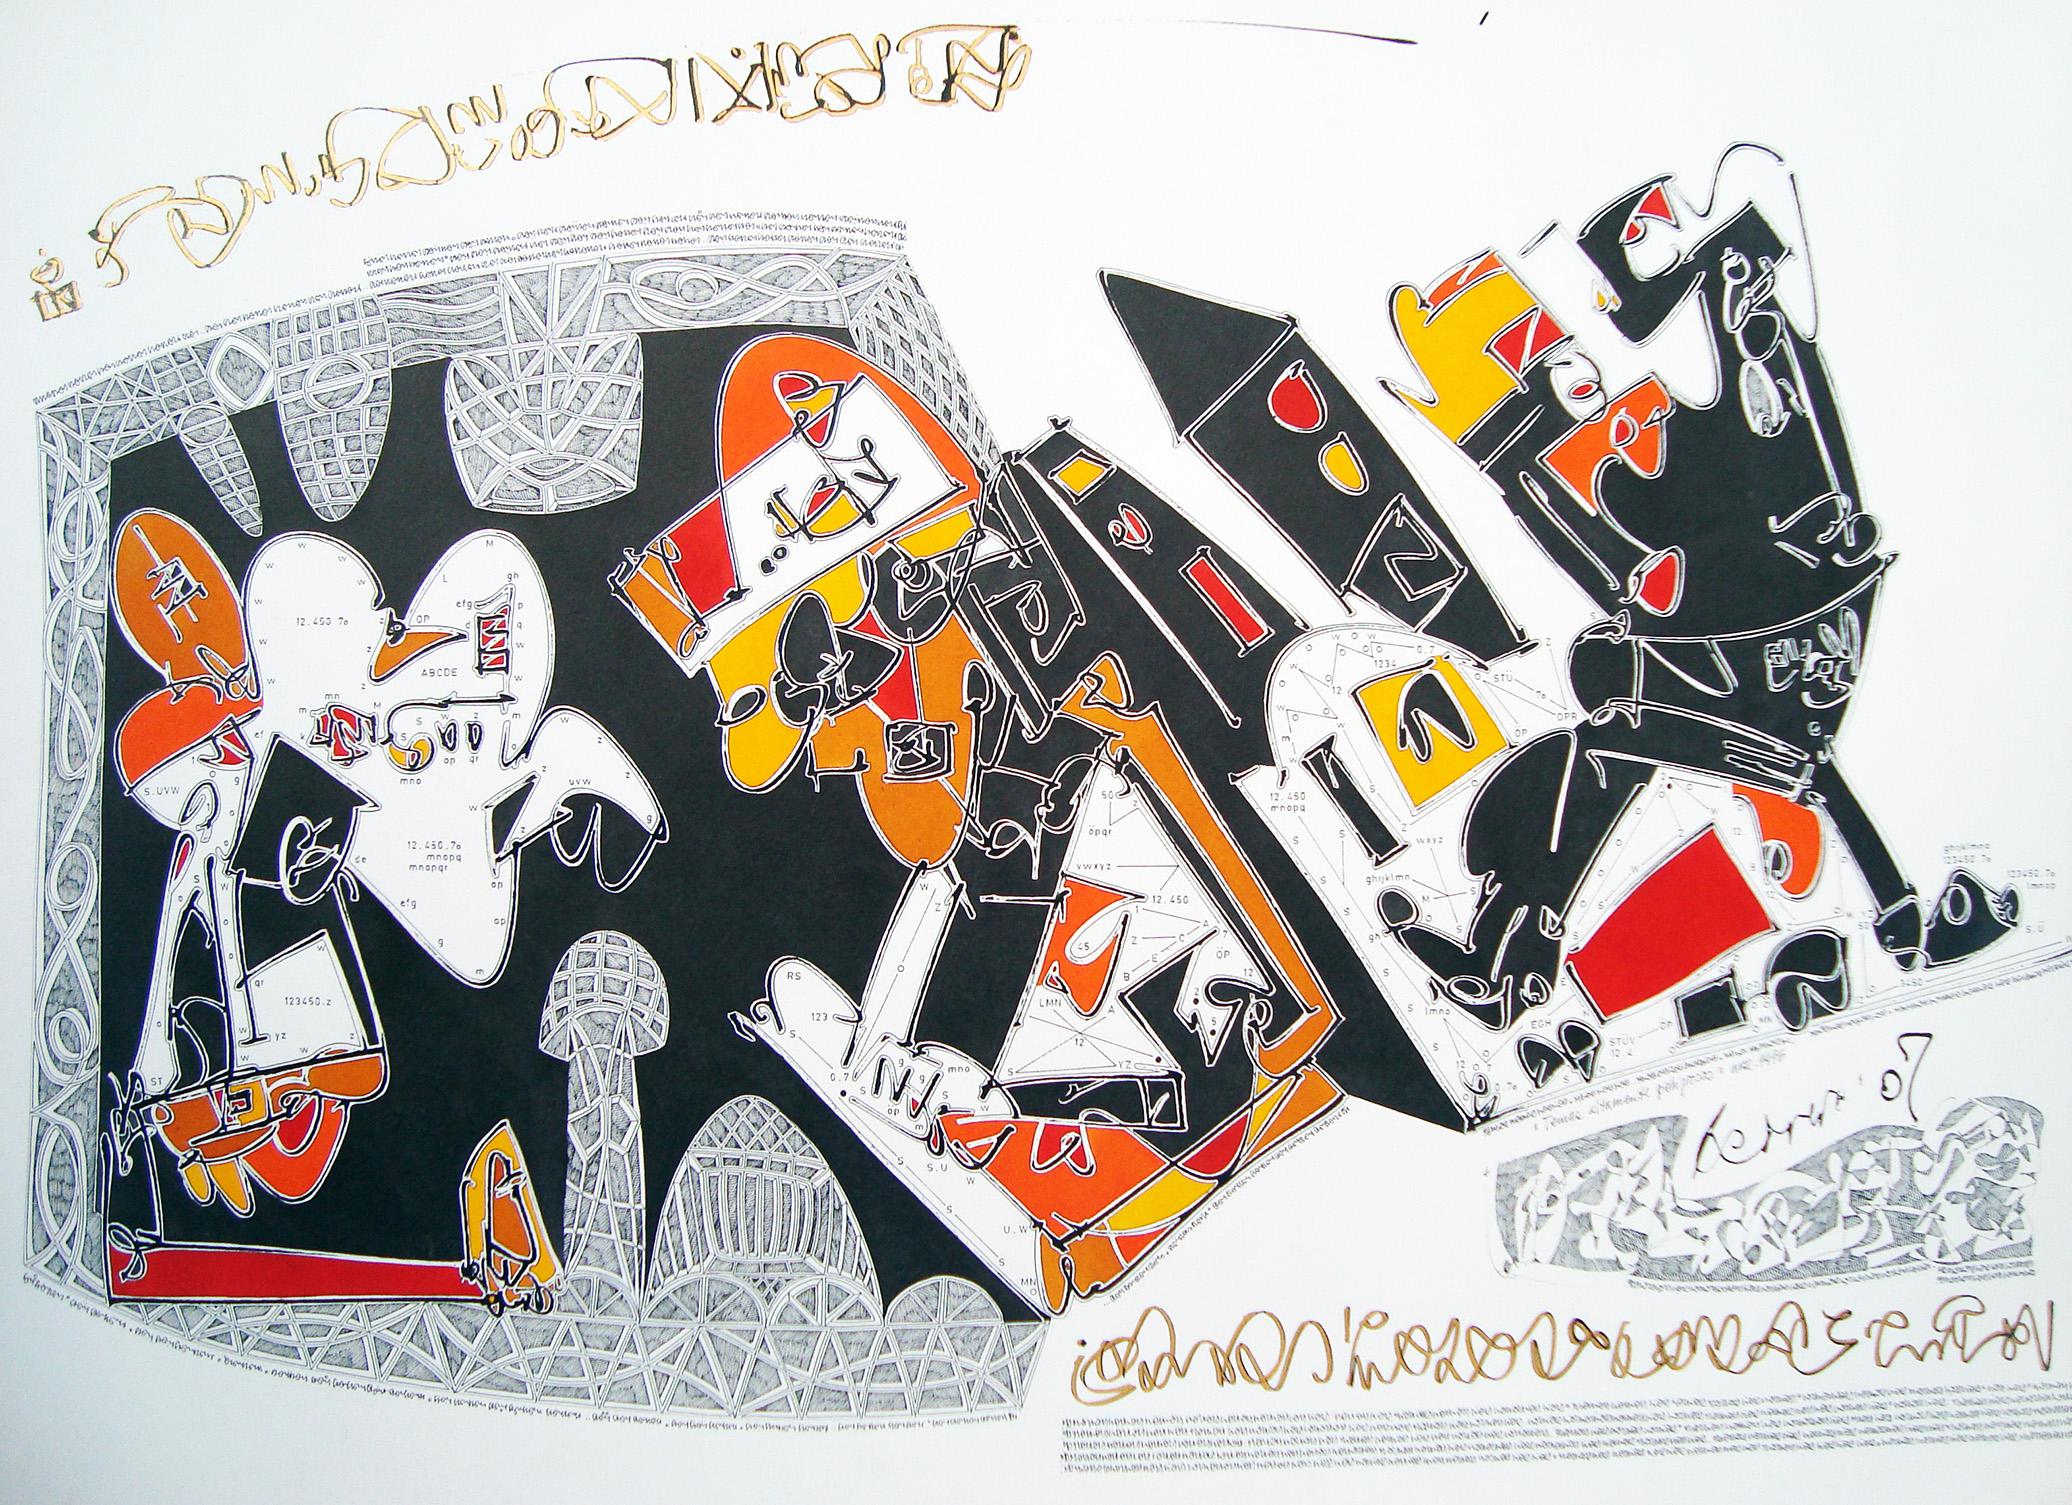 Temas altamente peligrosos artwork by Juan Carlos Norero - art listed for sale on Artplode